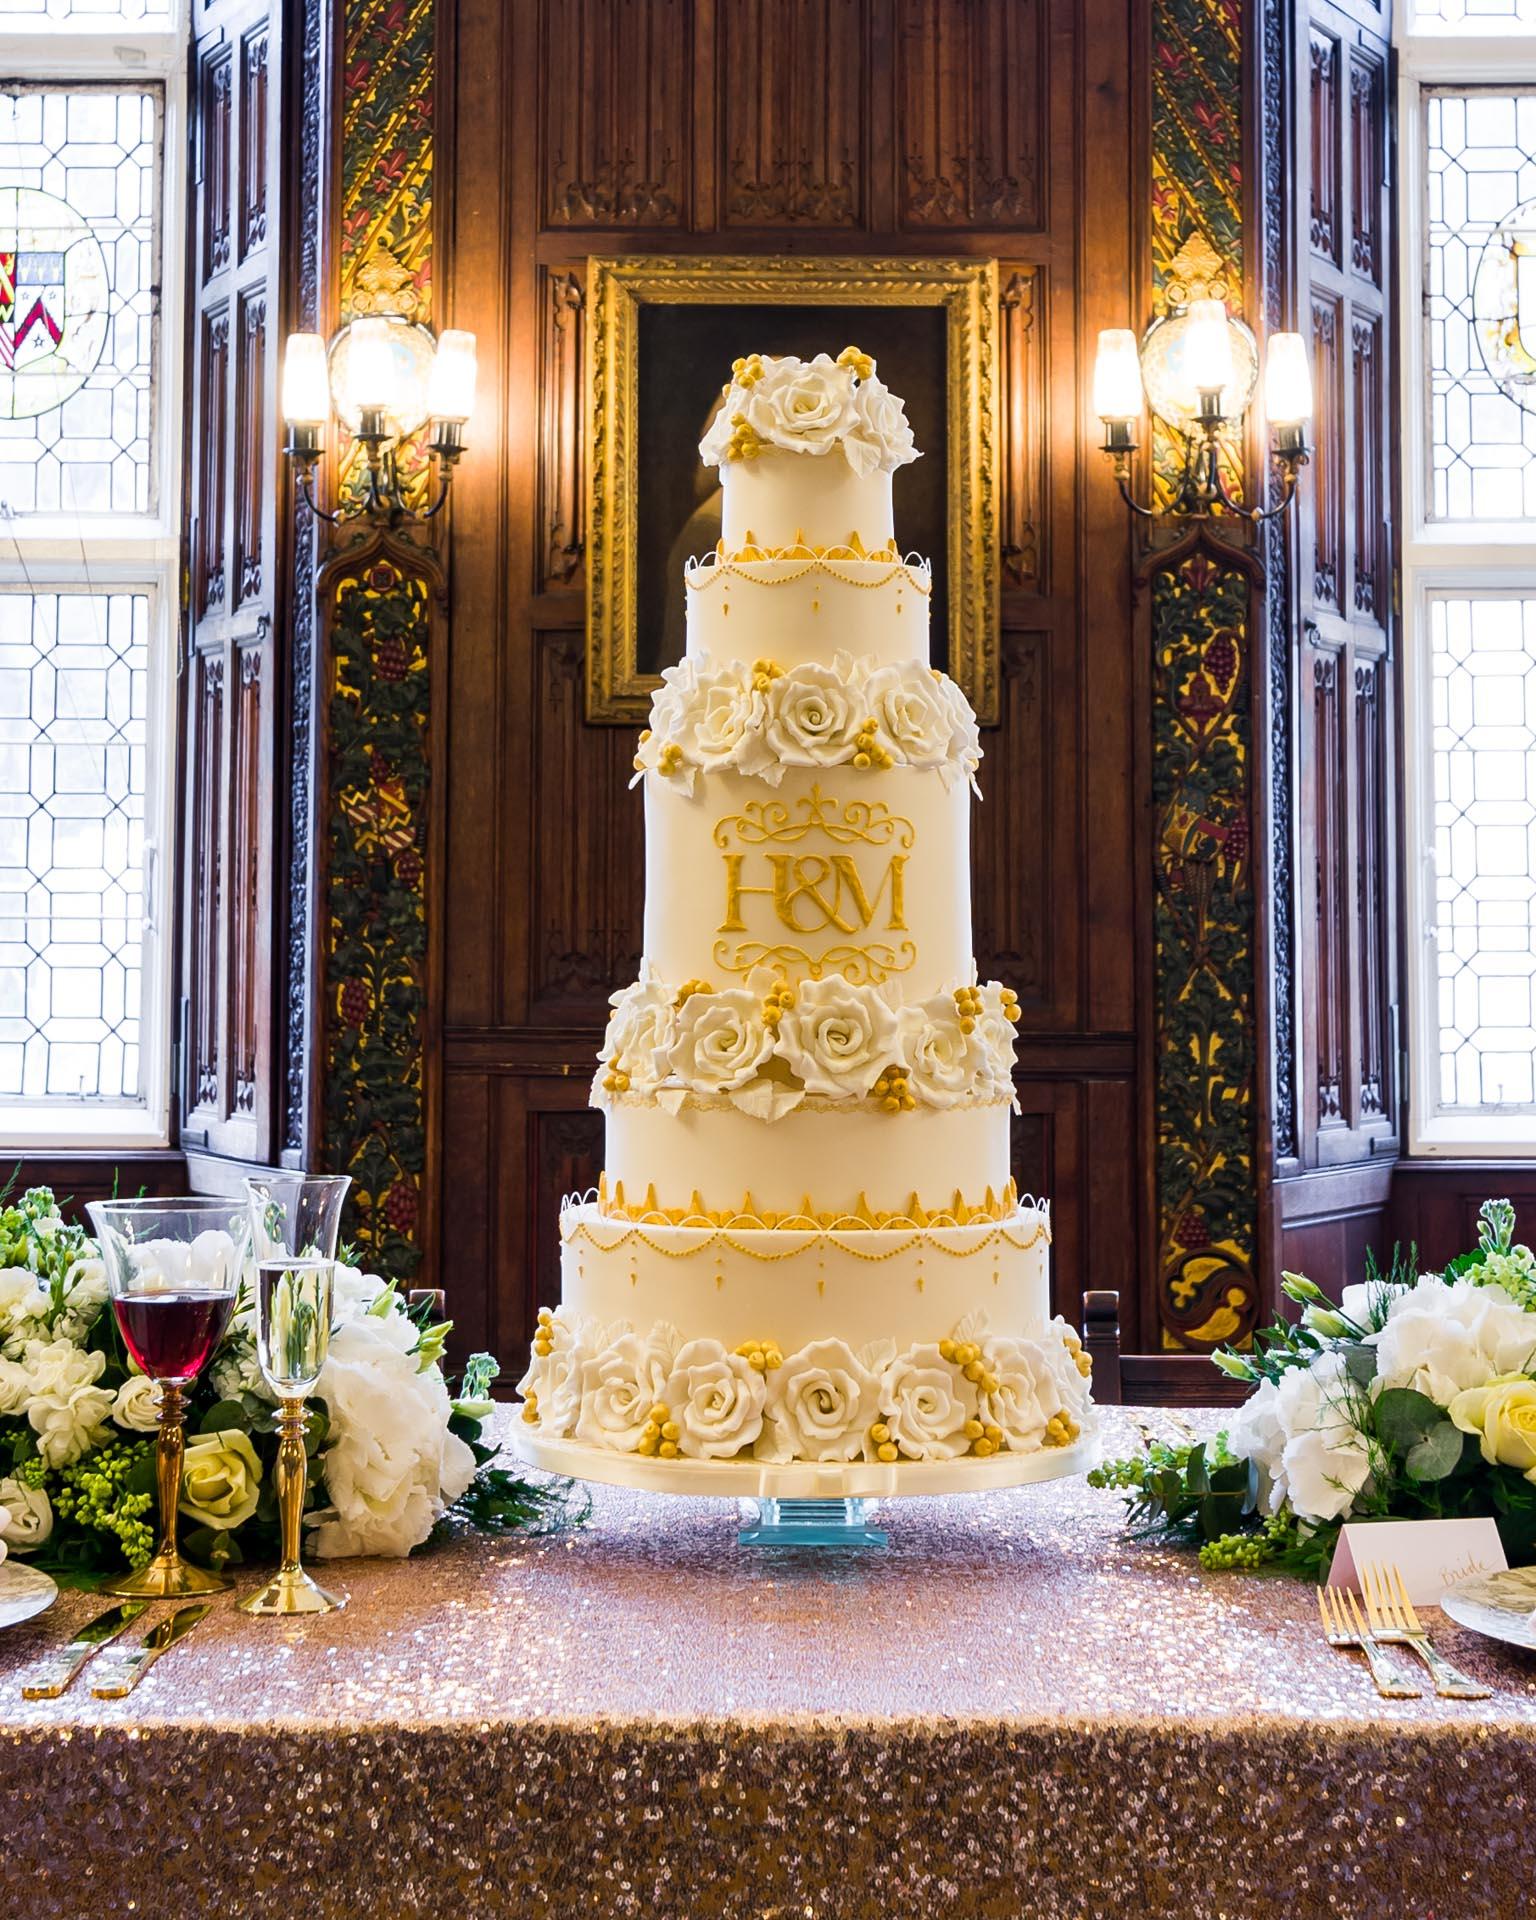 2019 Wedding Cake Trends